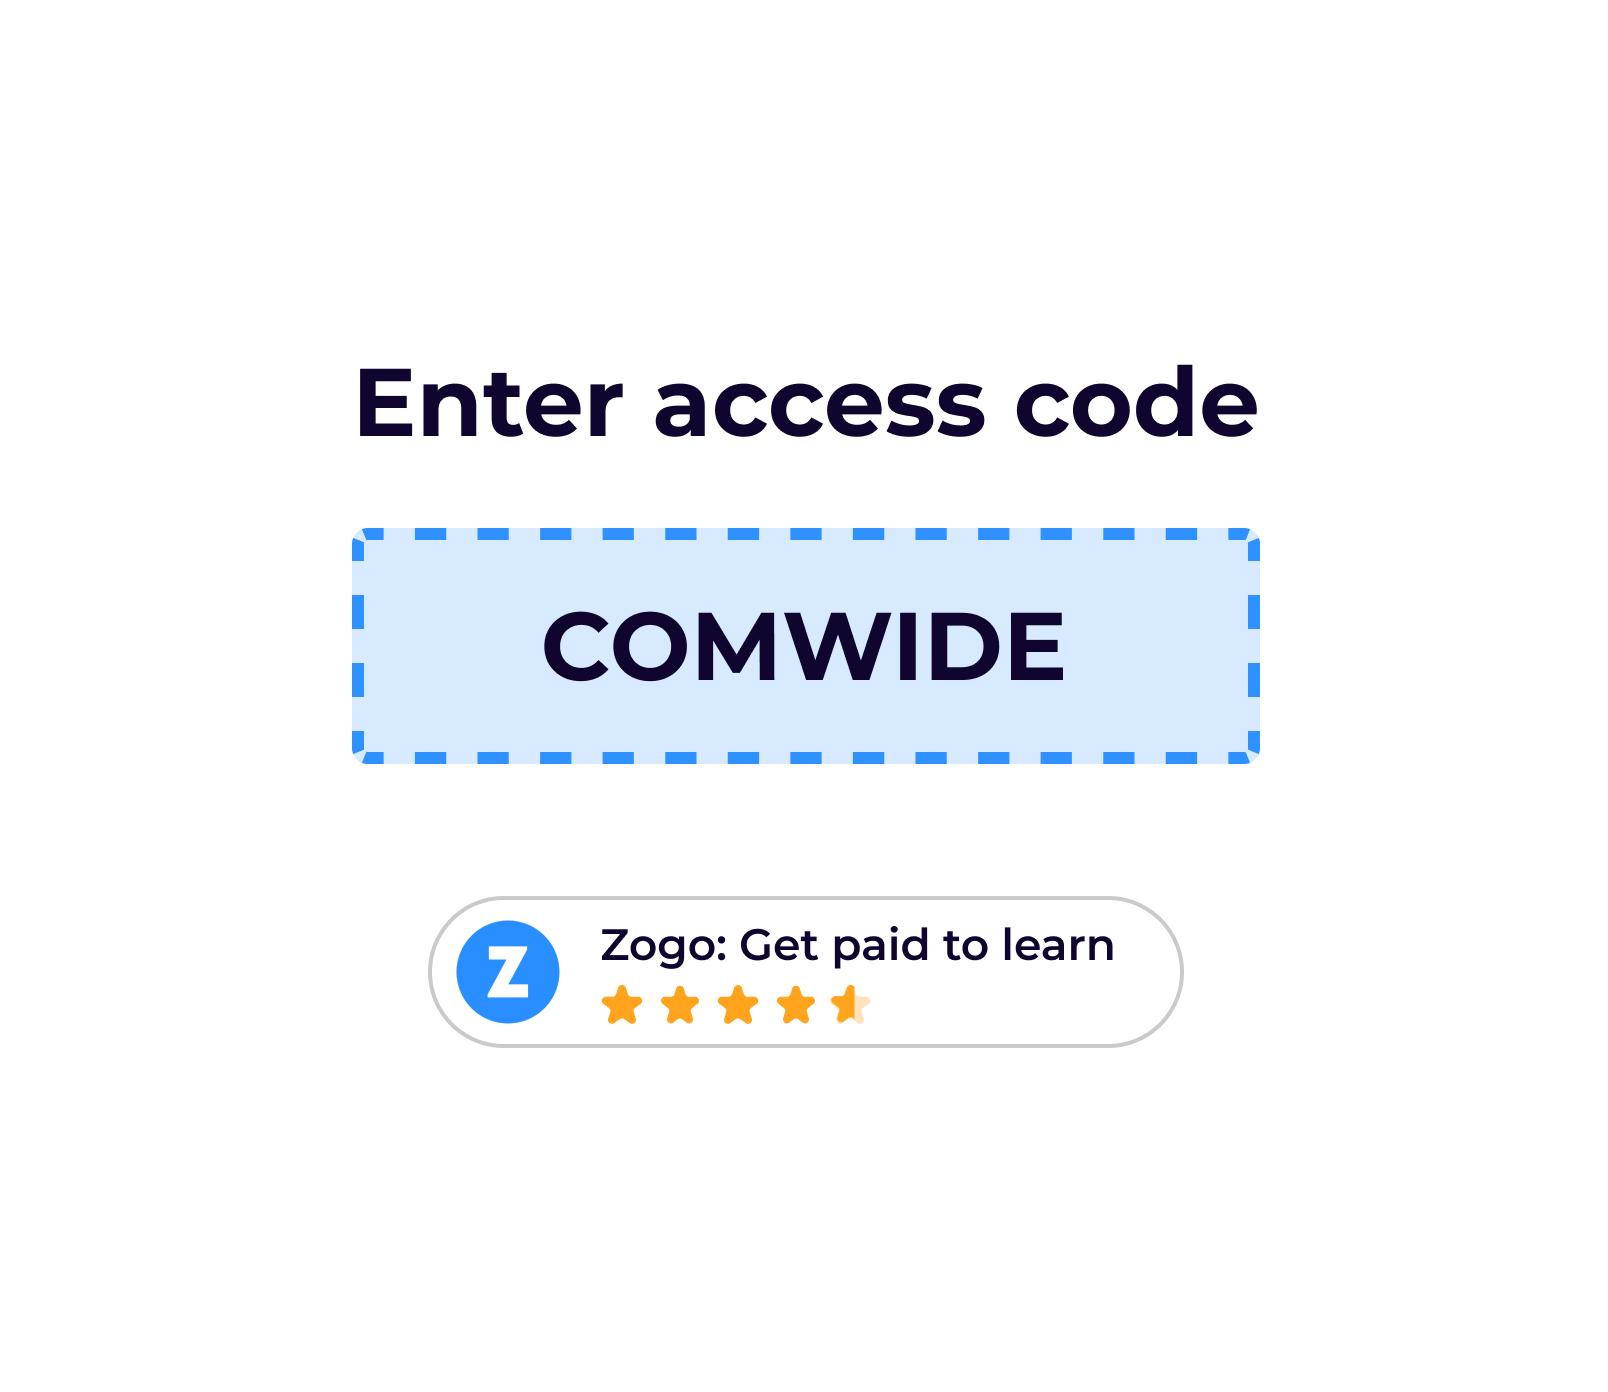 COMWIDEAccessCode.png